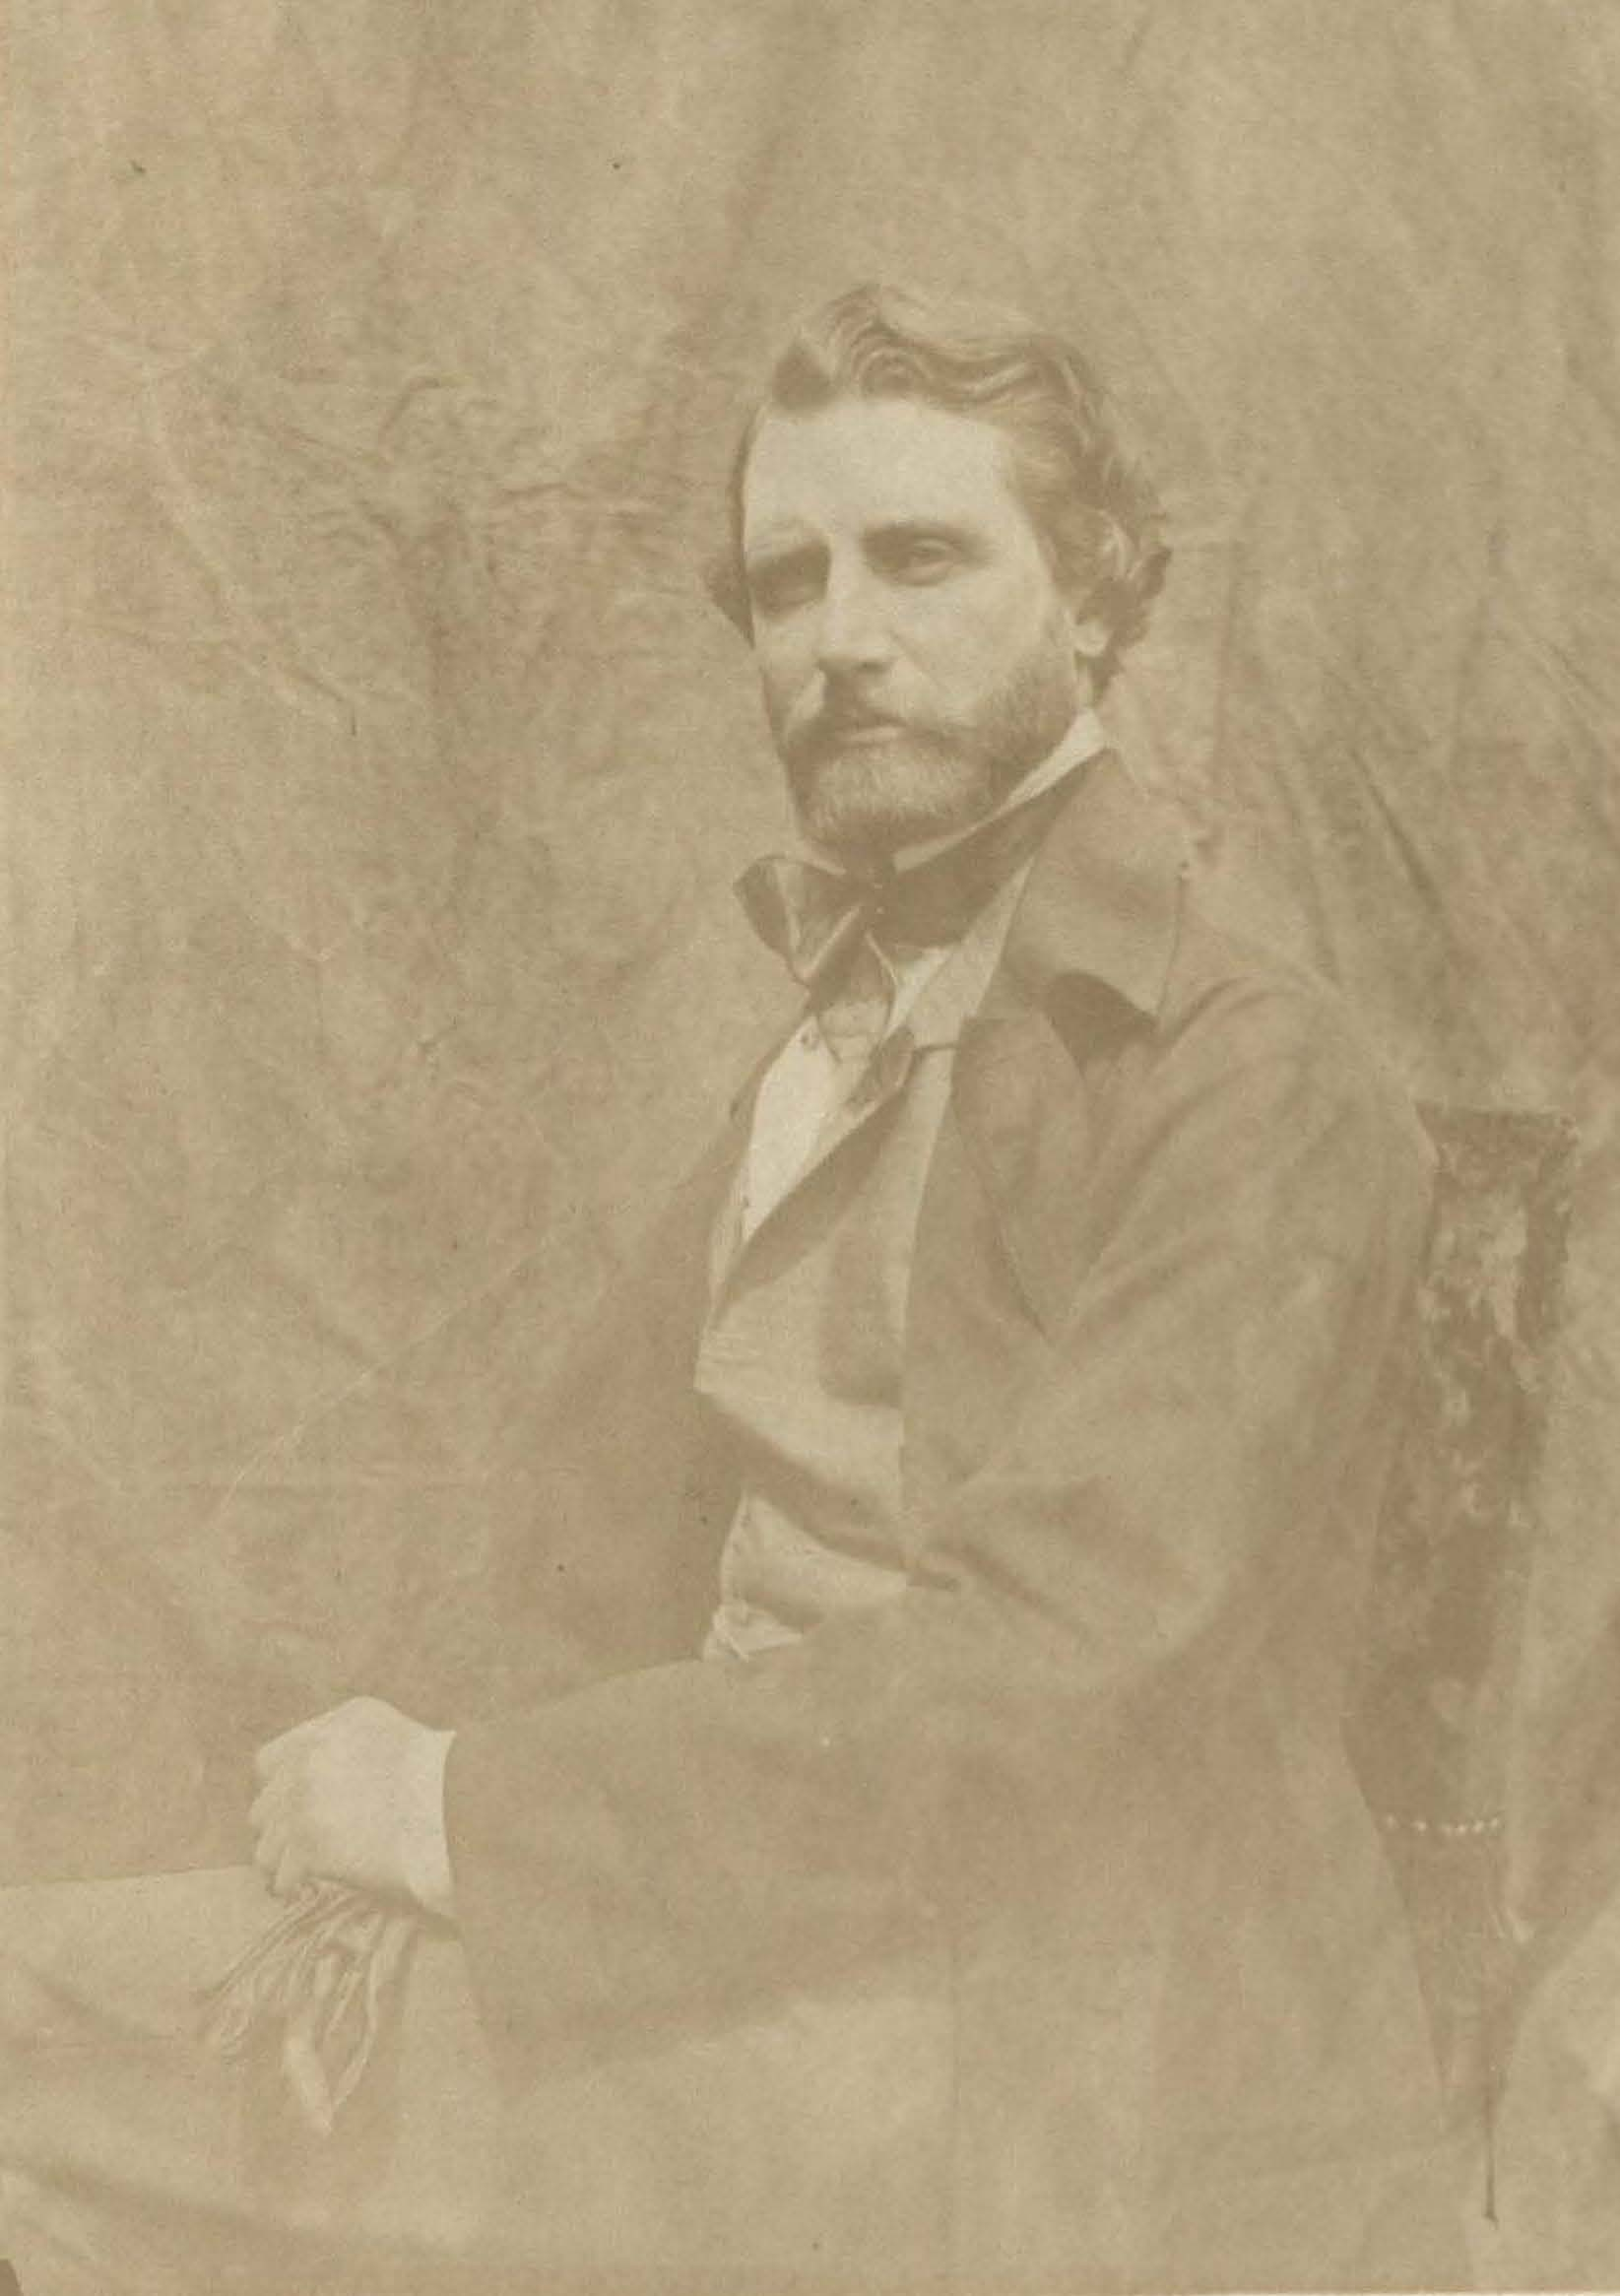 Photographic portrait of Frederic William Burton inlaid in Madonna Pia volume (MS E184)